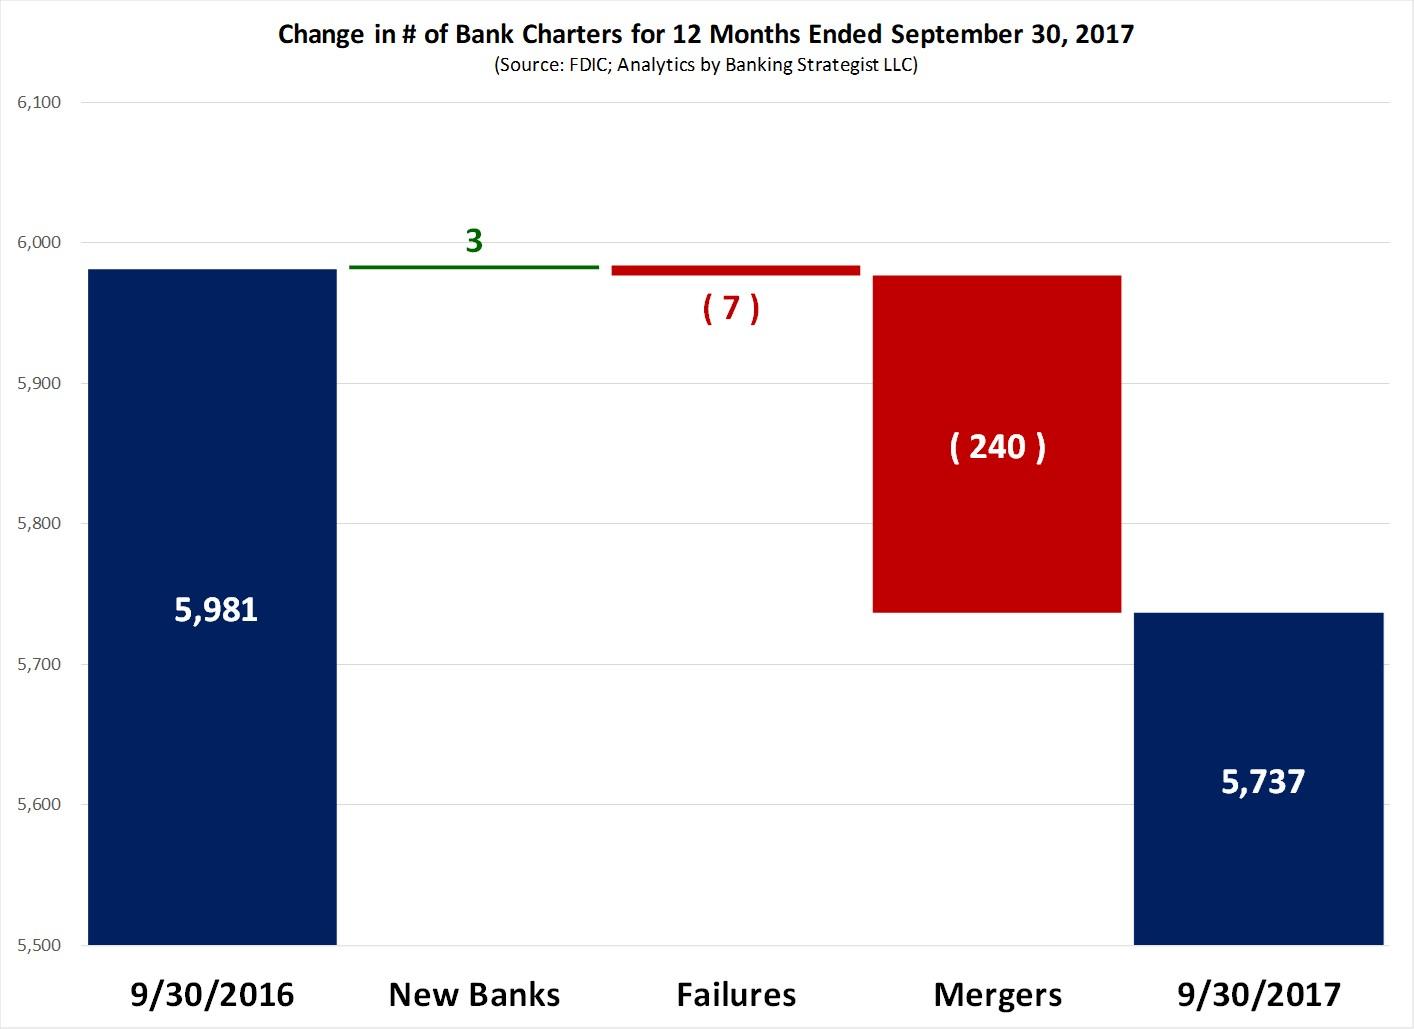 Chg_Bank_Charters_20170930_Type.jpg